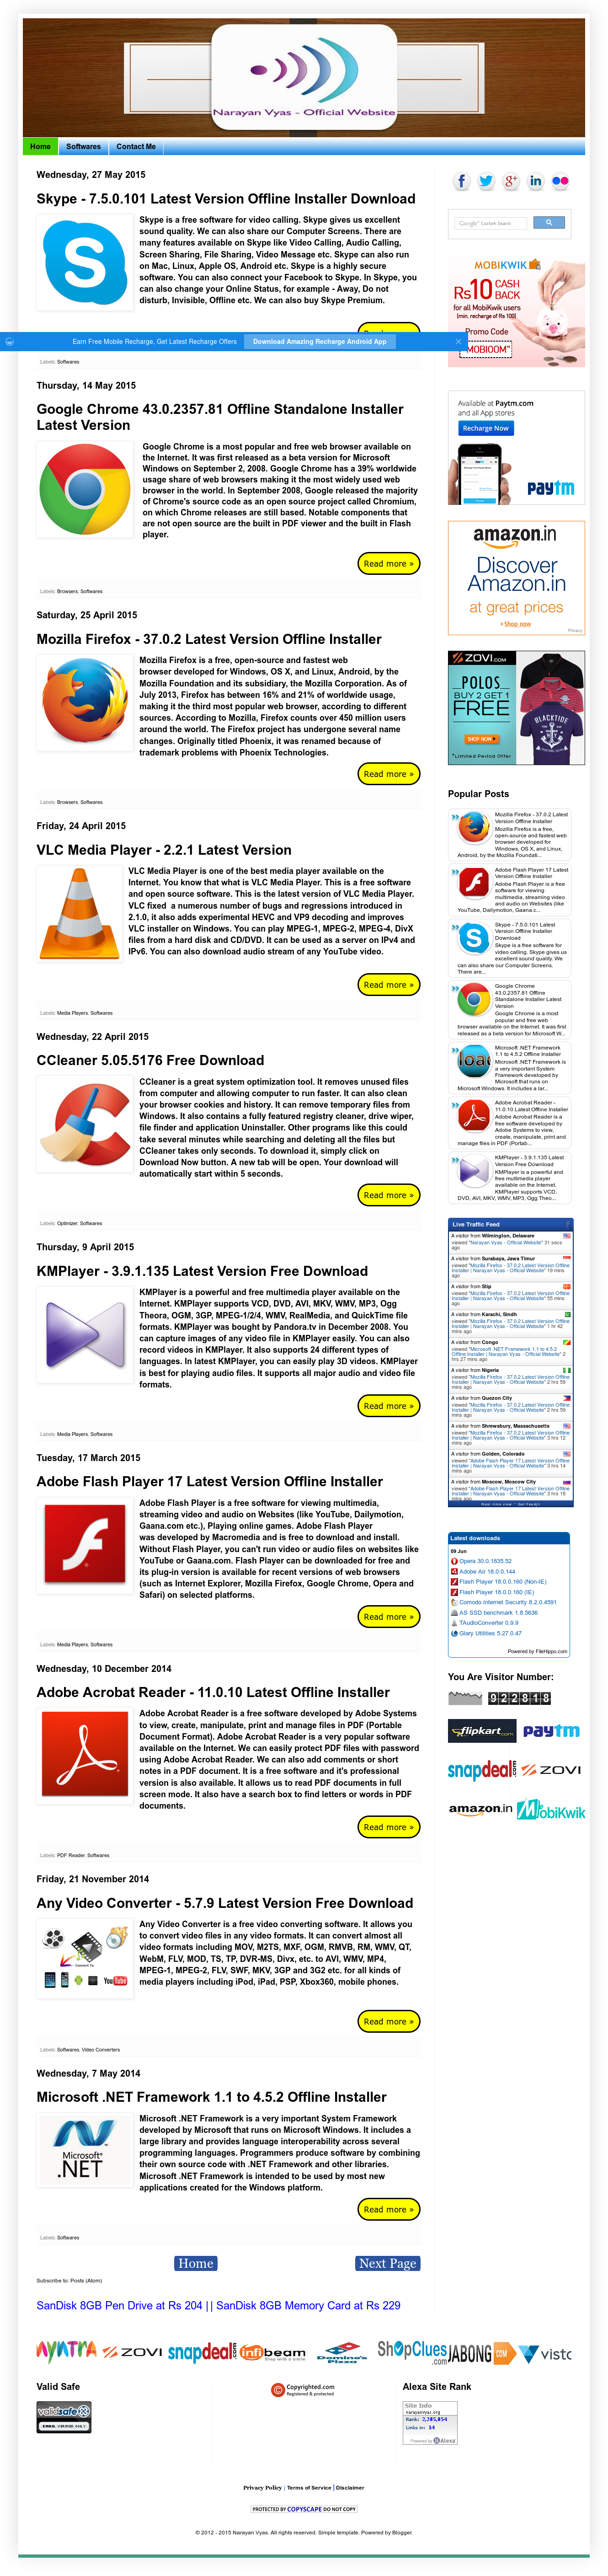 adobe flash player download standalone installer